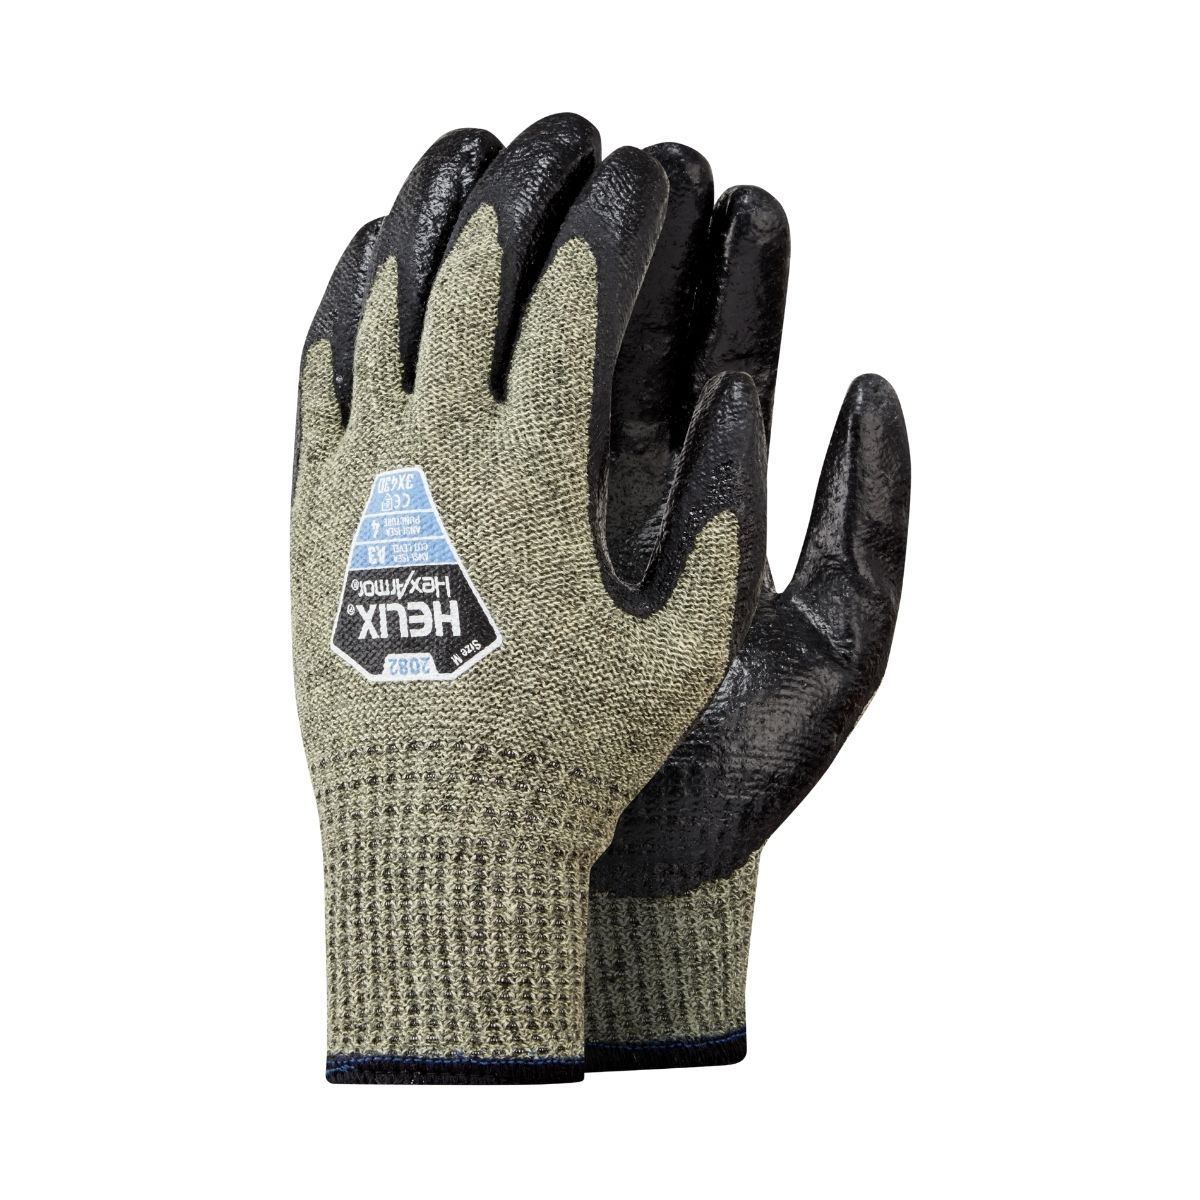 GL2082 Hexarmor Helix 2082 ARC Glove